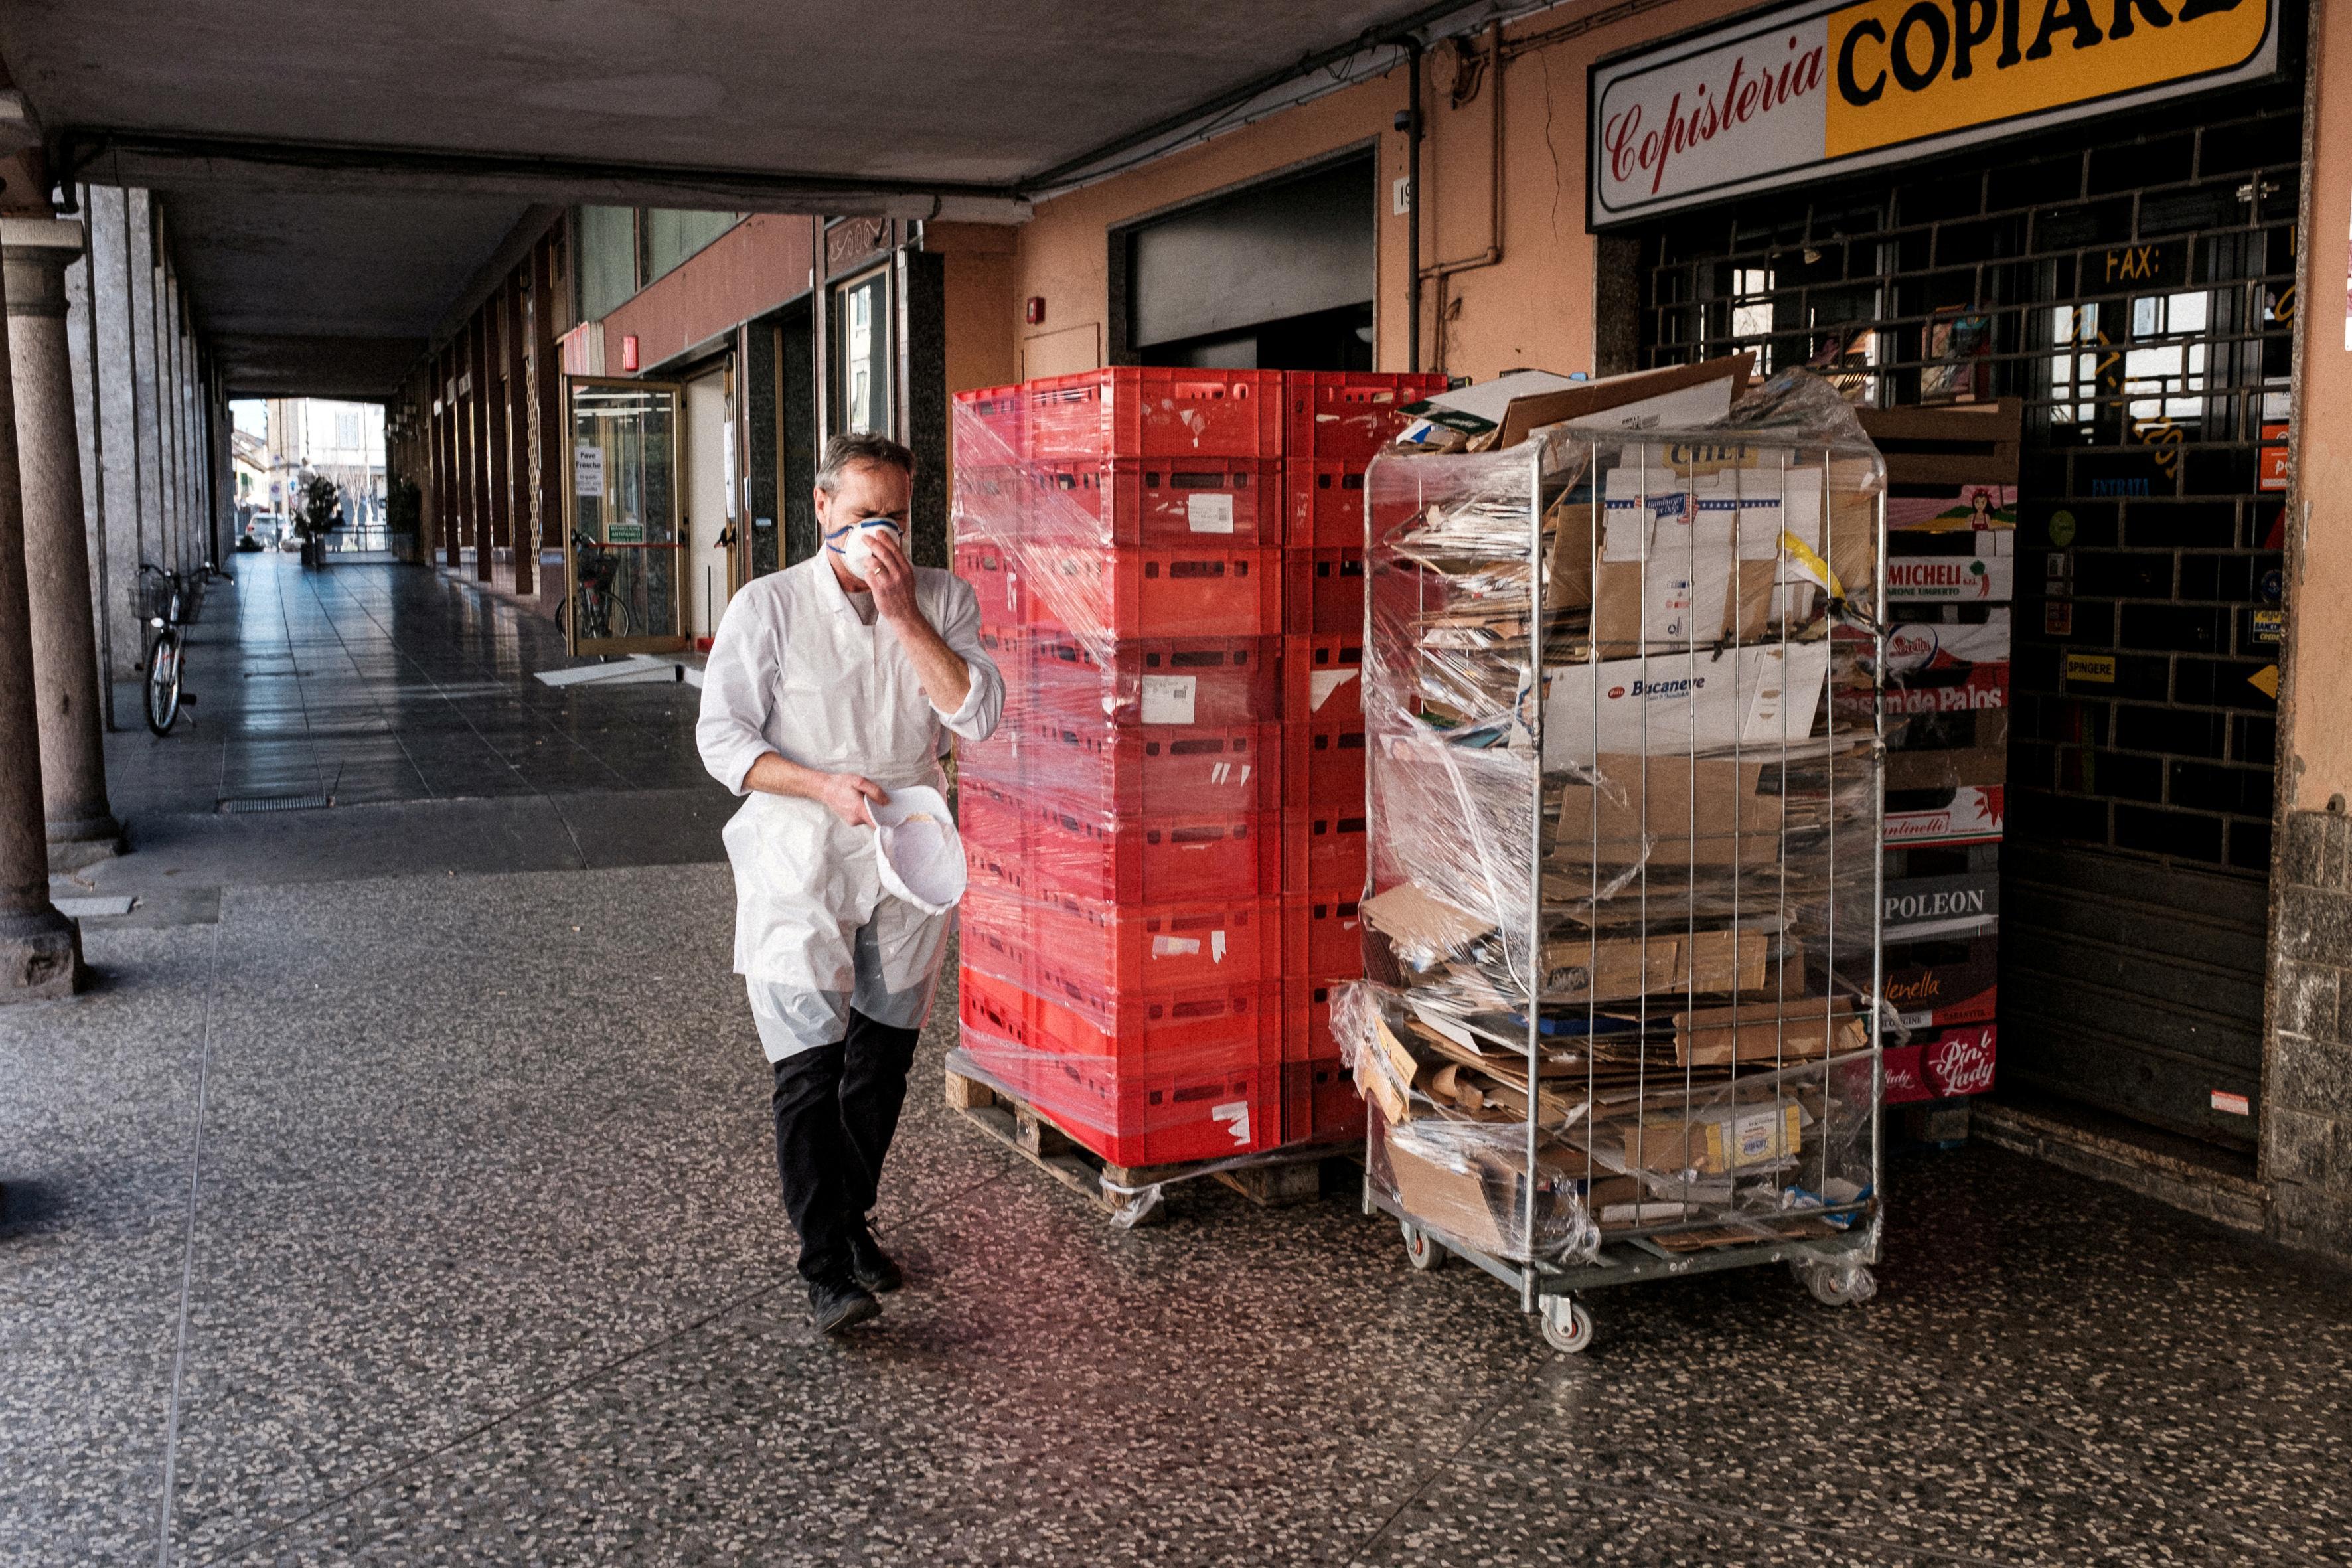 As coronavirus slams Italy, paralysis and anxiety spread